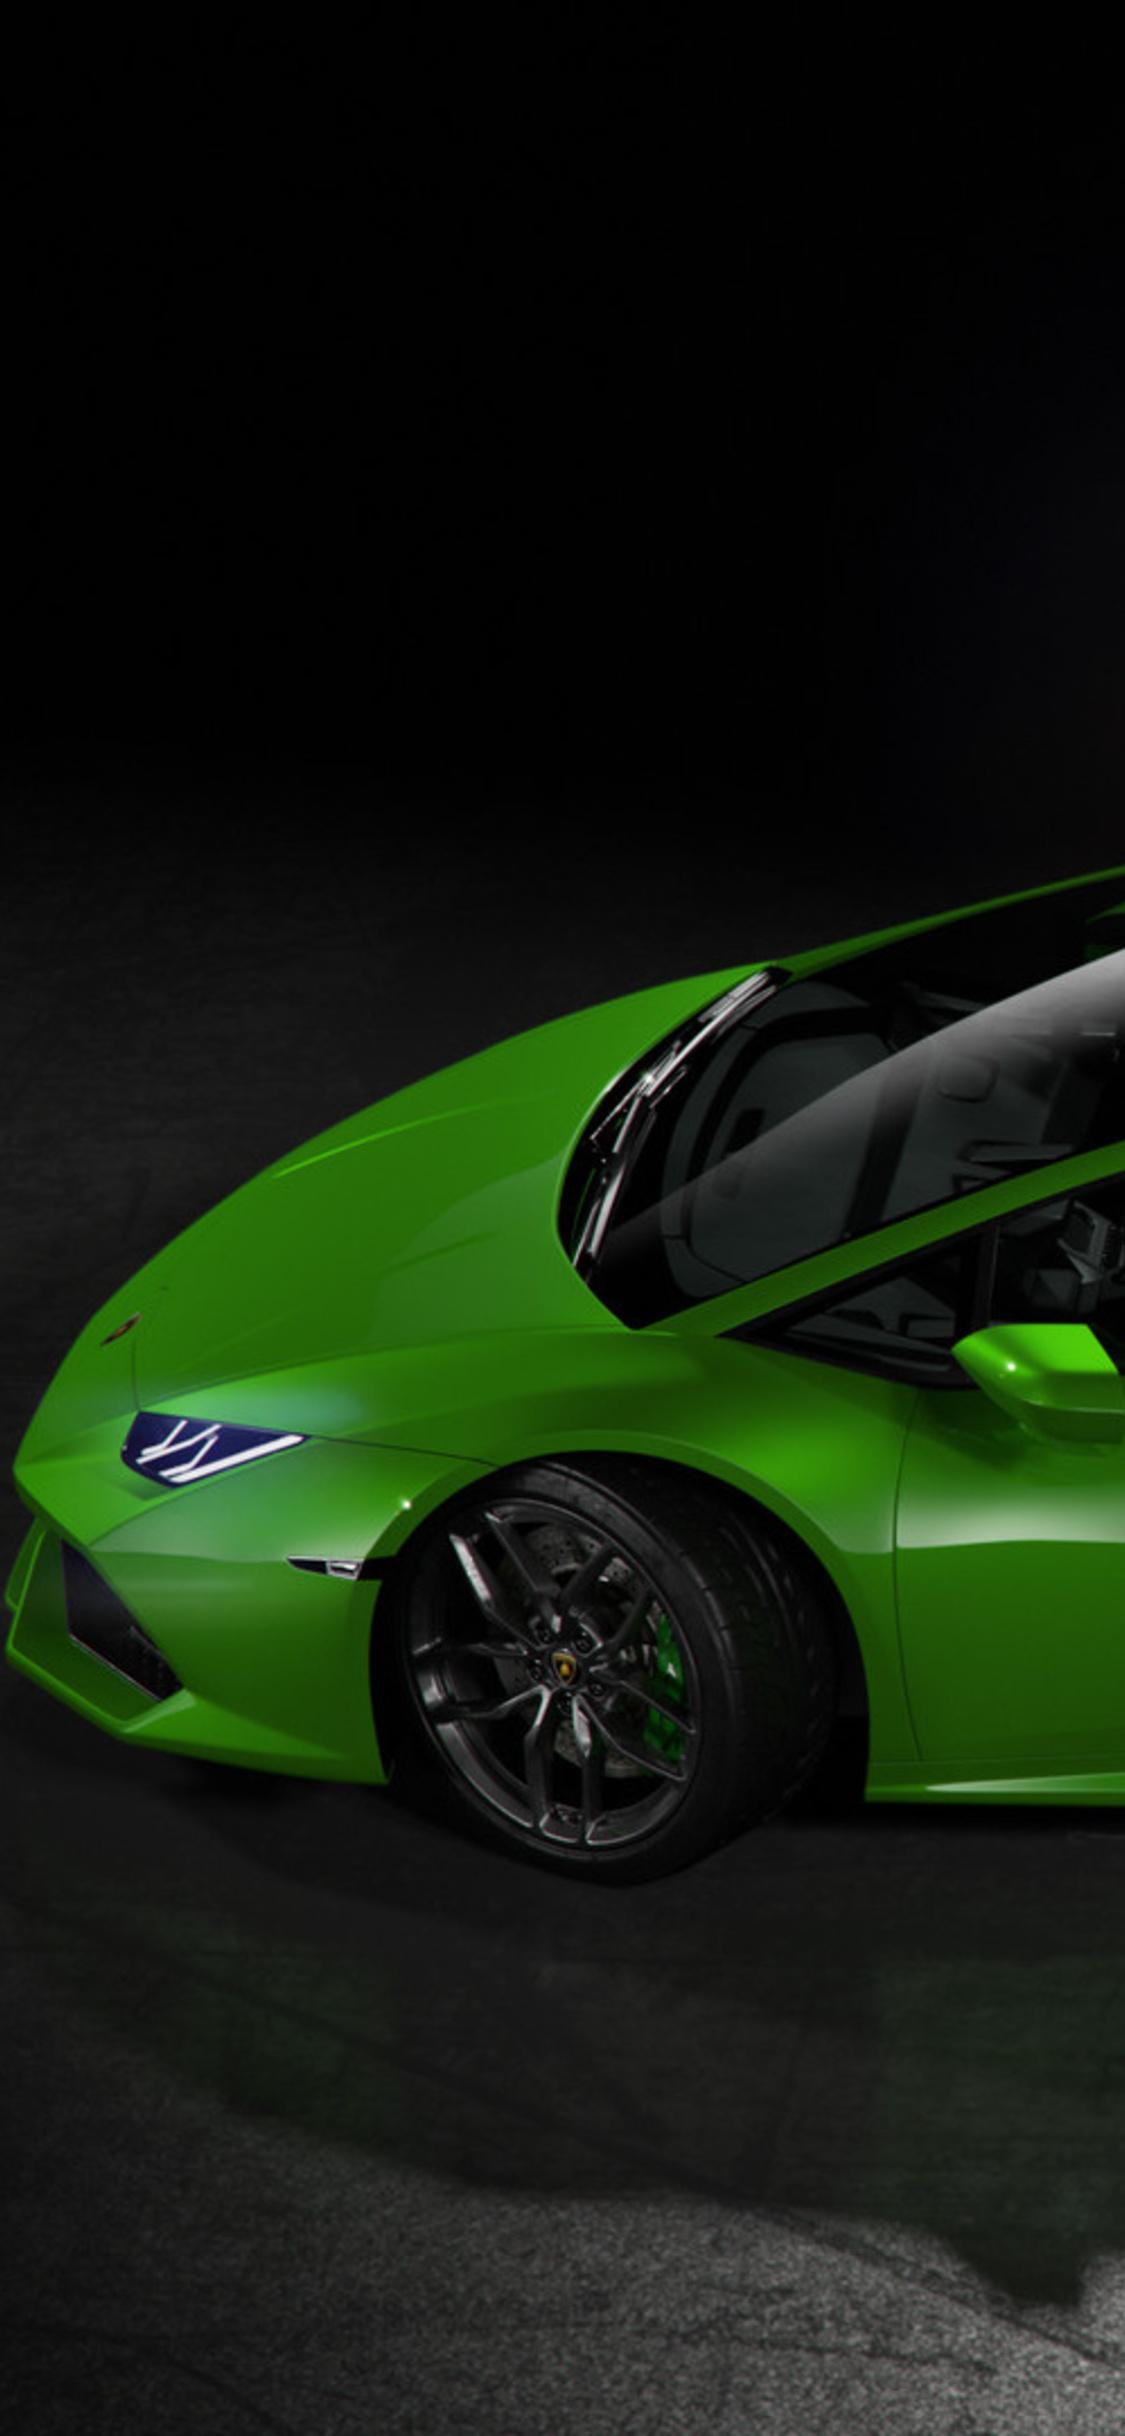 1125x2436 Green Lamborghini Huracan Side View Iphone Xs